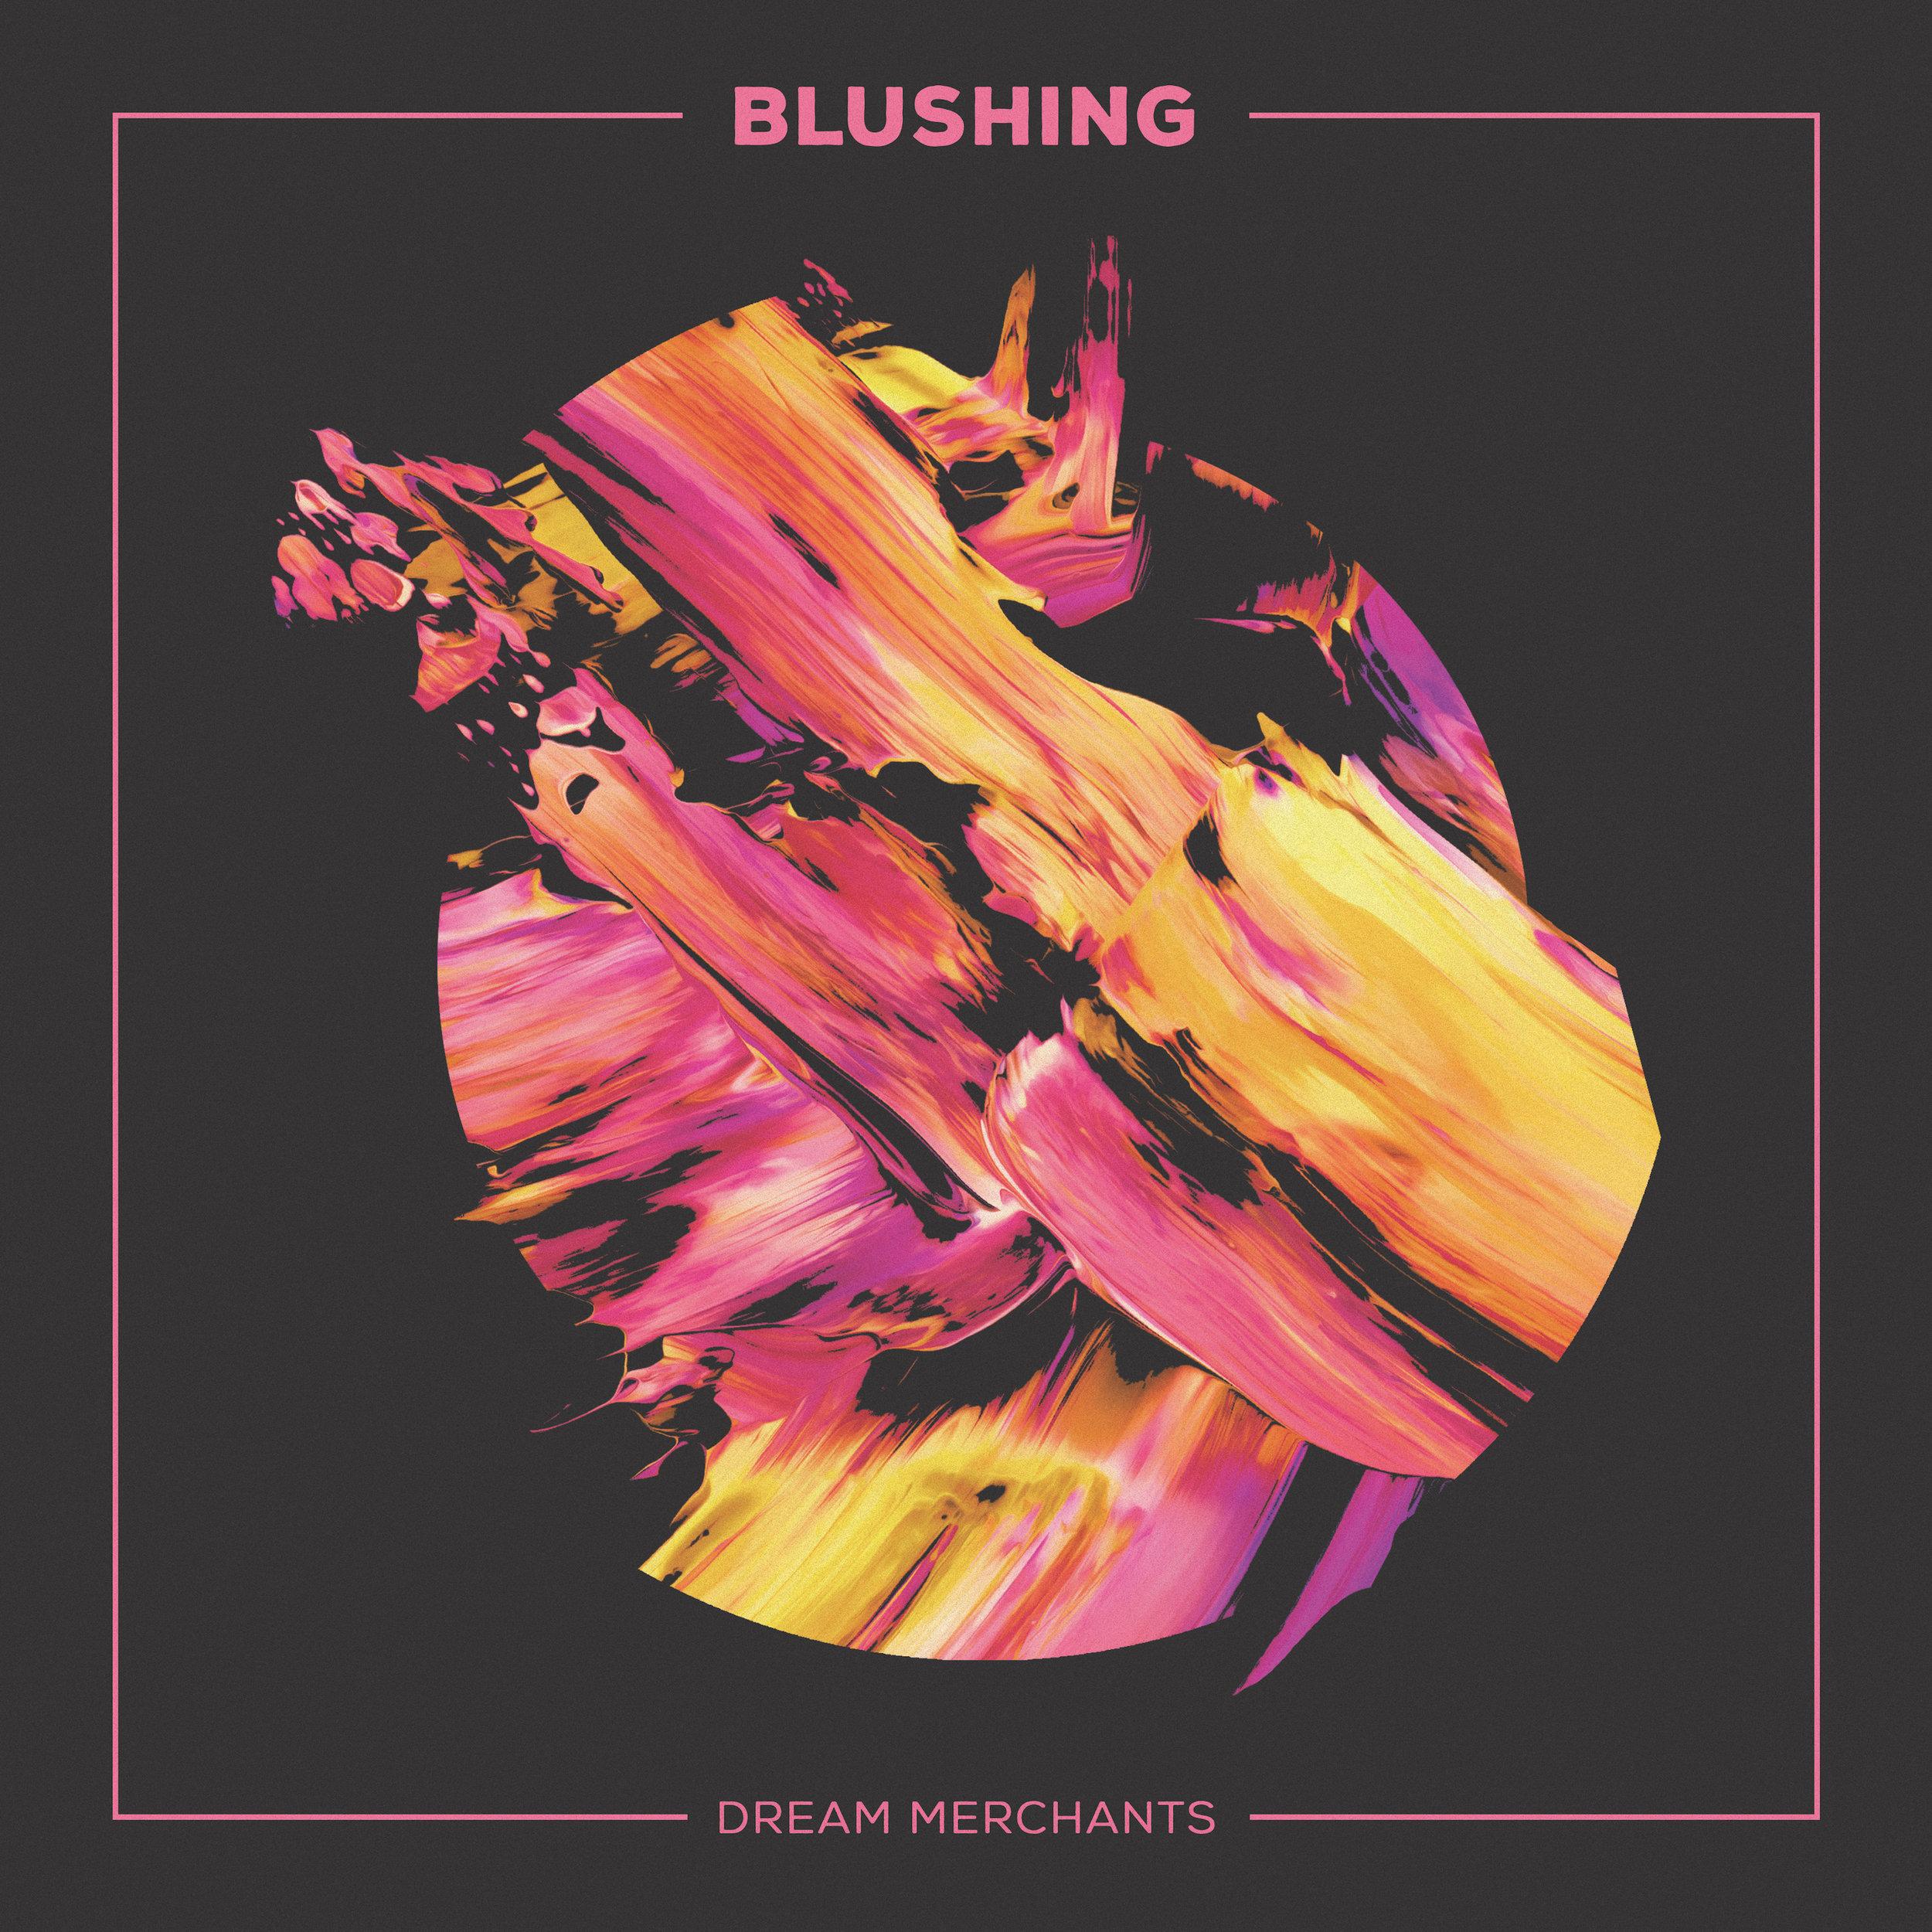 Blushing Dream Merchants Single Artwork.jpg